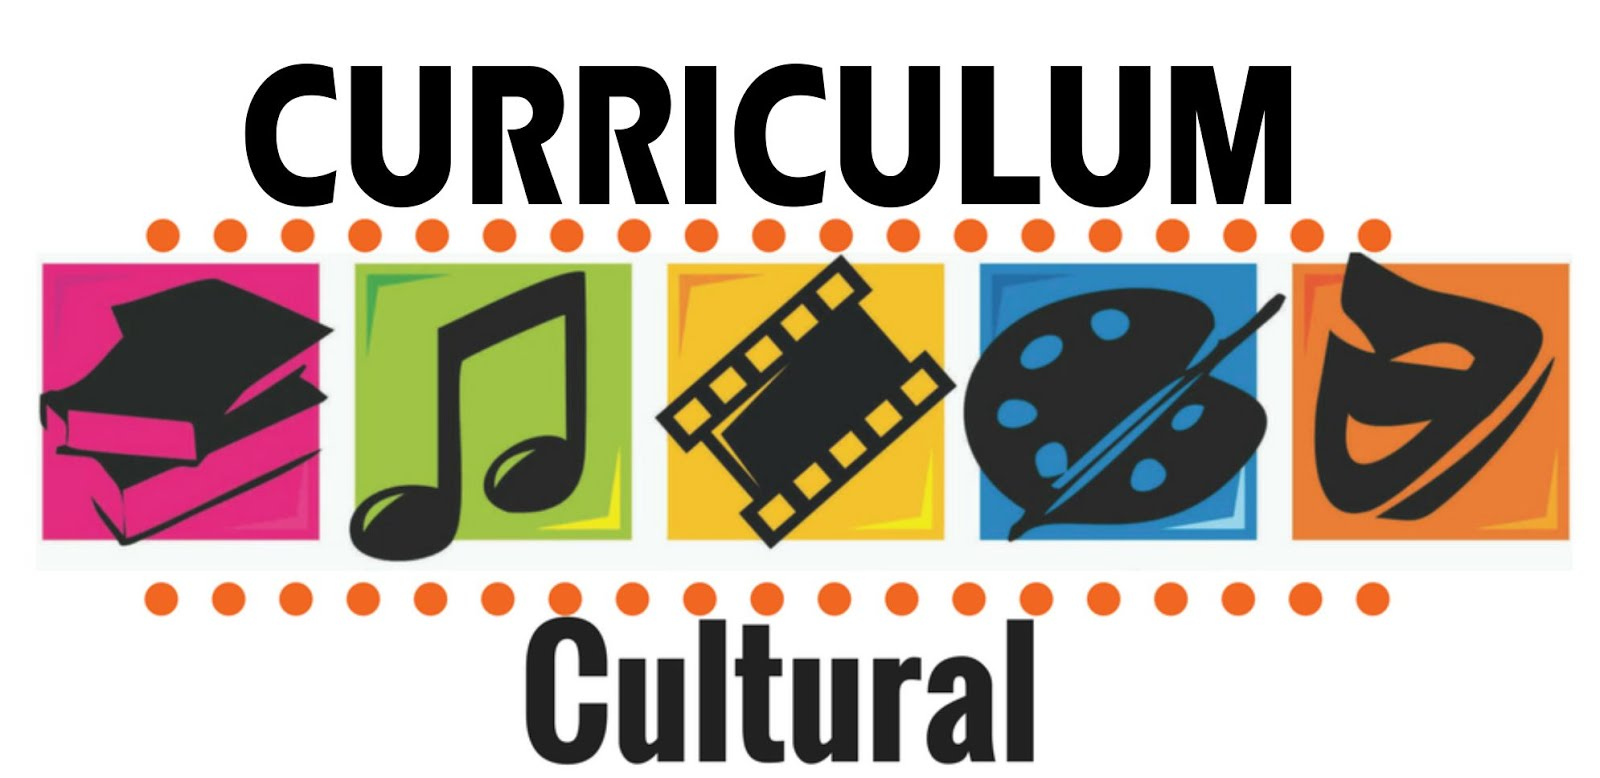 CURRICULUM CULTURAL